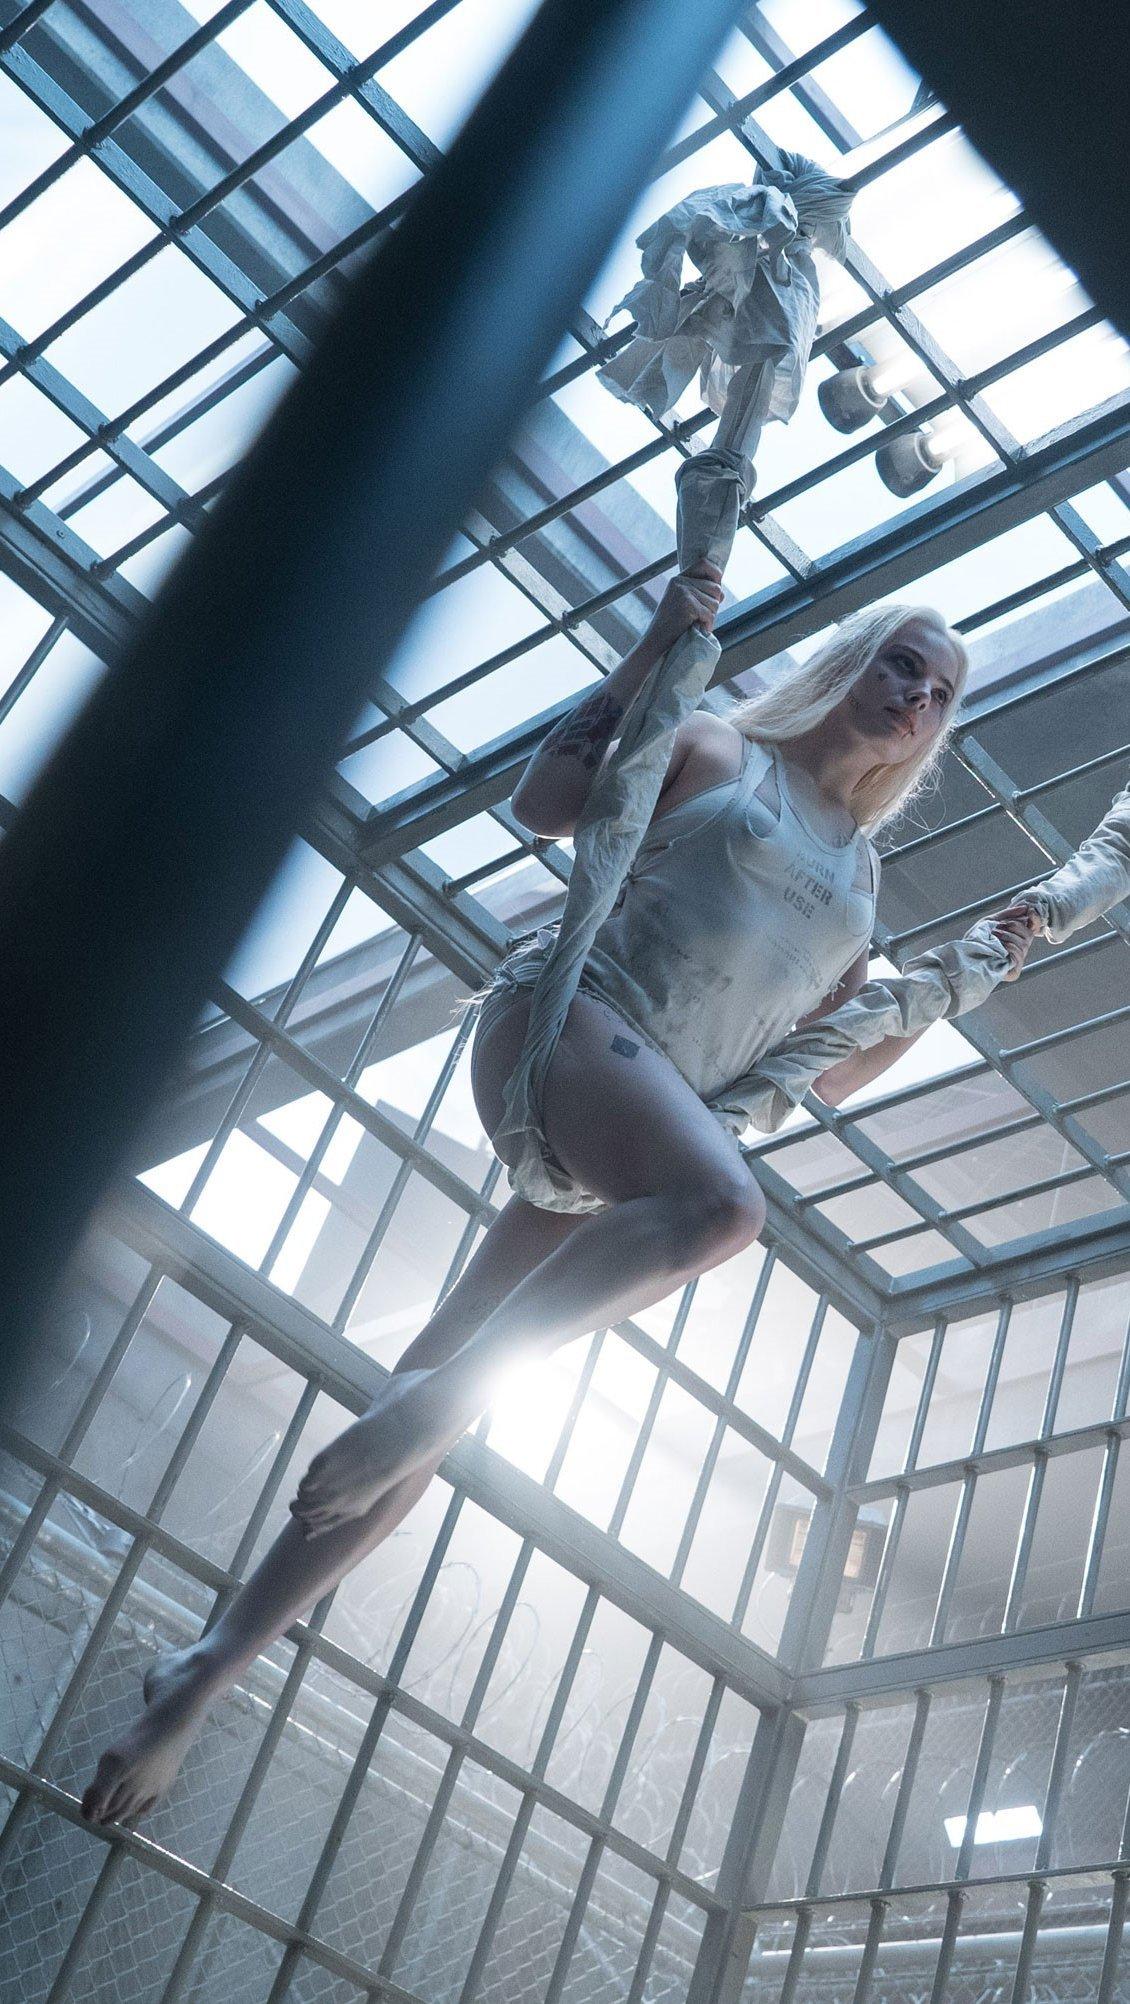 Fondos de pantalla Harley Quinn en prisión Escuadrón suicida Vertical